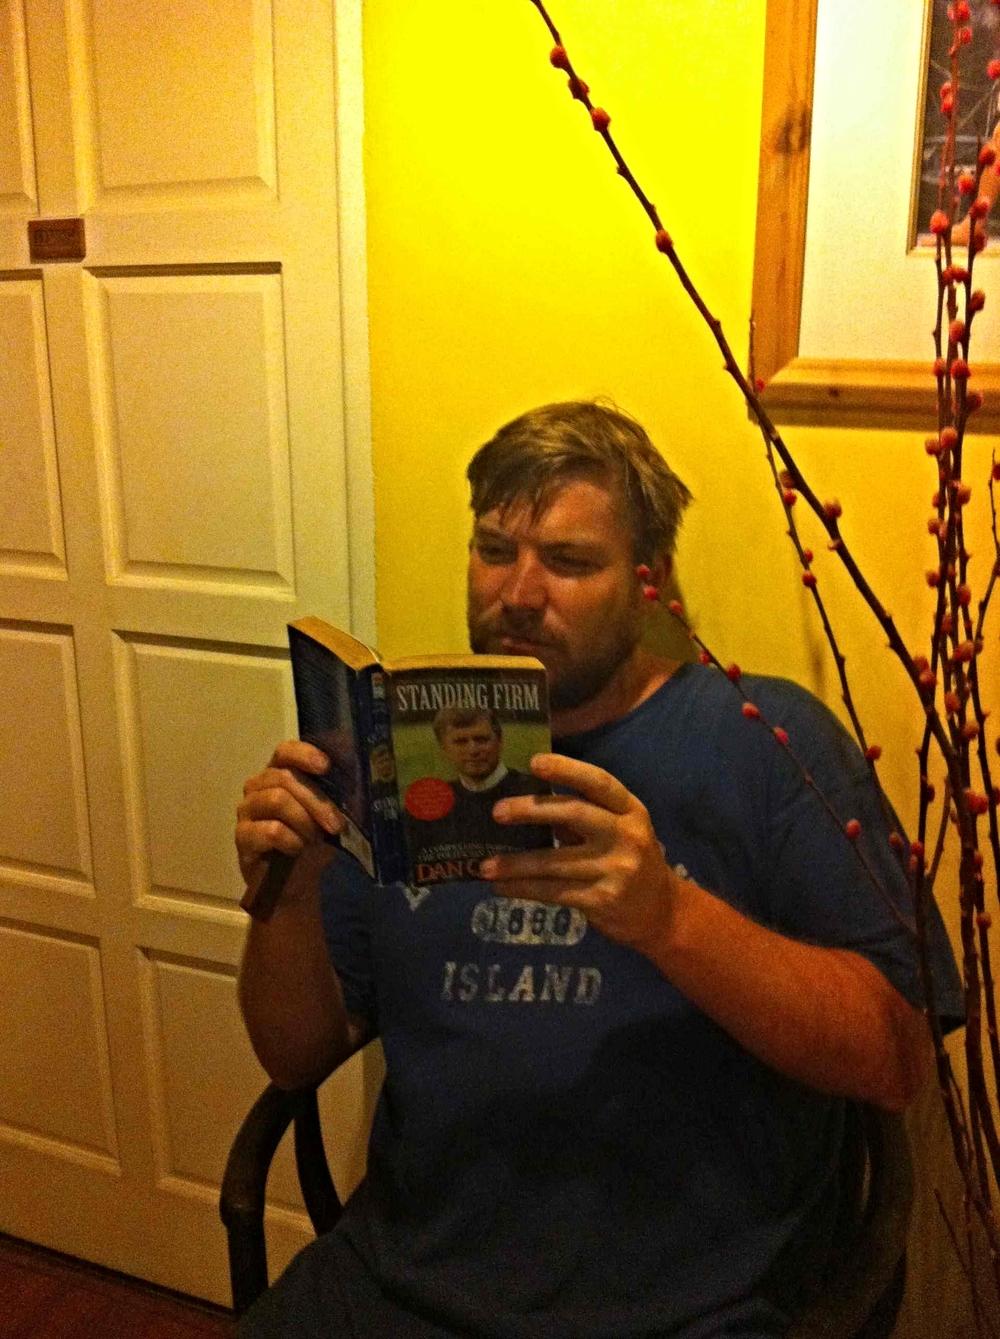 Enjoying the Dan Qualye Autobiography